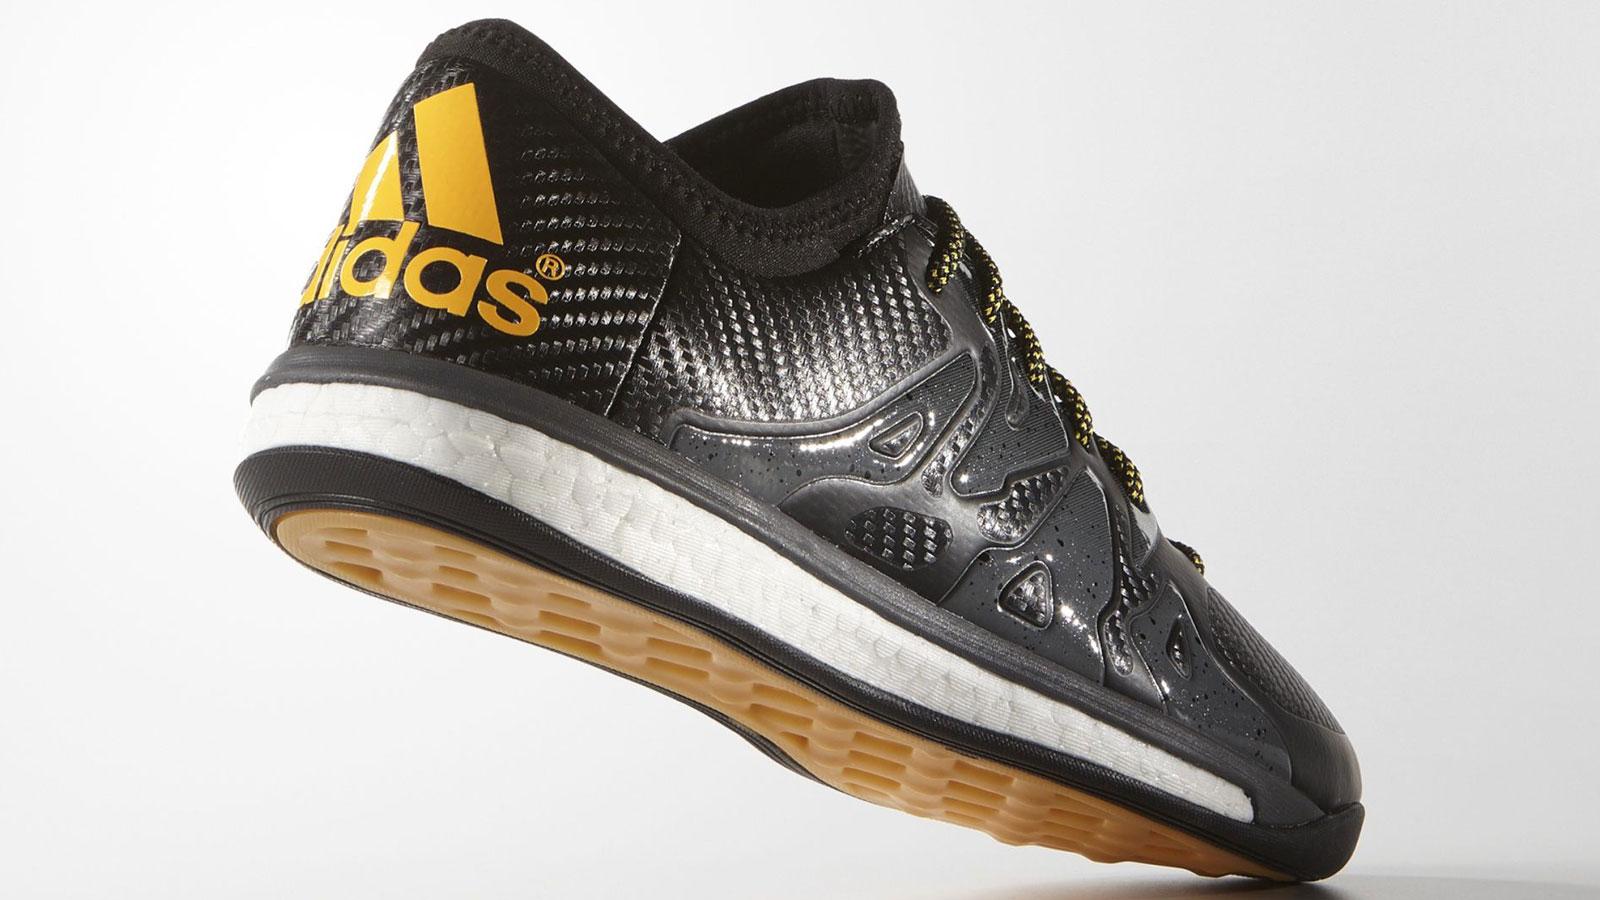 d9a8dc222 buy adidas street soccer shoes 1e1c7 50f0d